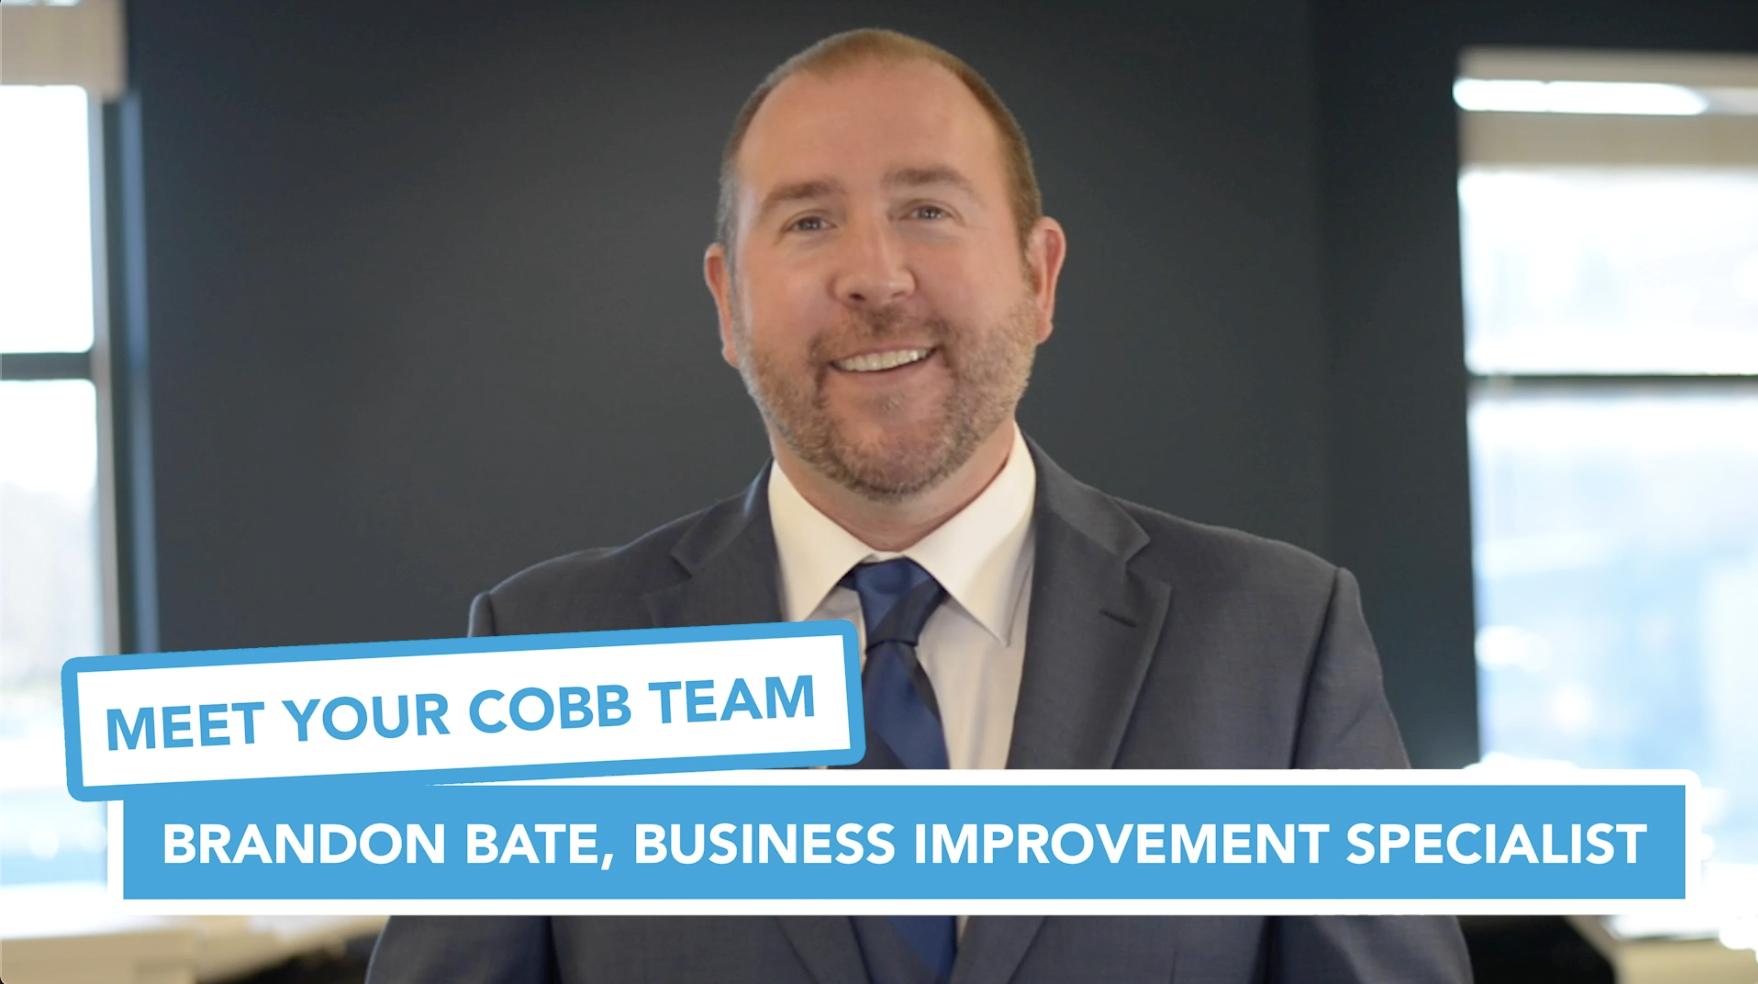 Meet Your Cobb Team Brandon Bate, Business Improvement Specialist